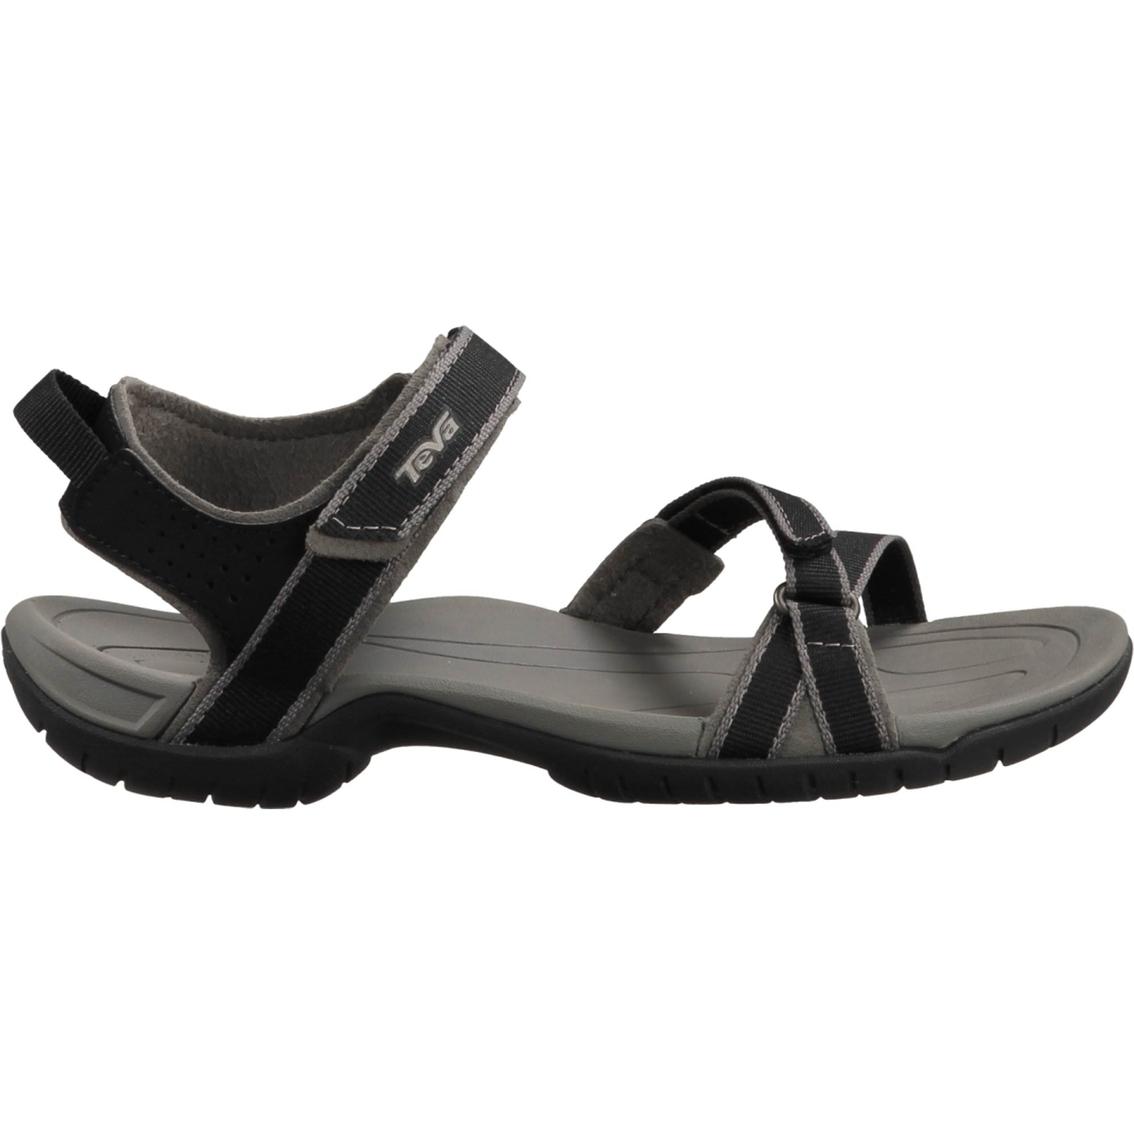 teva athletic sandals